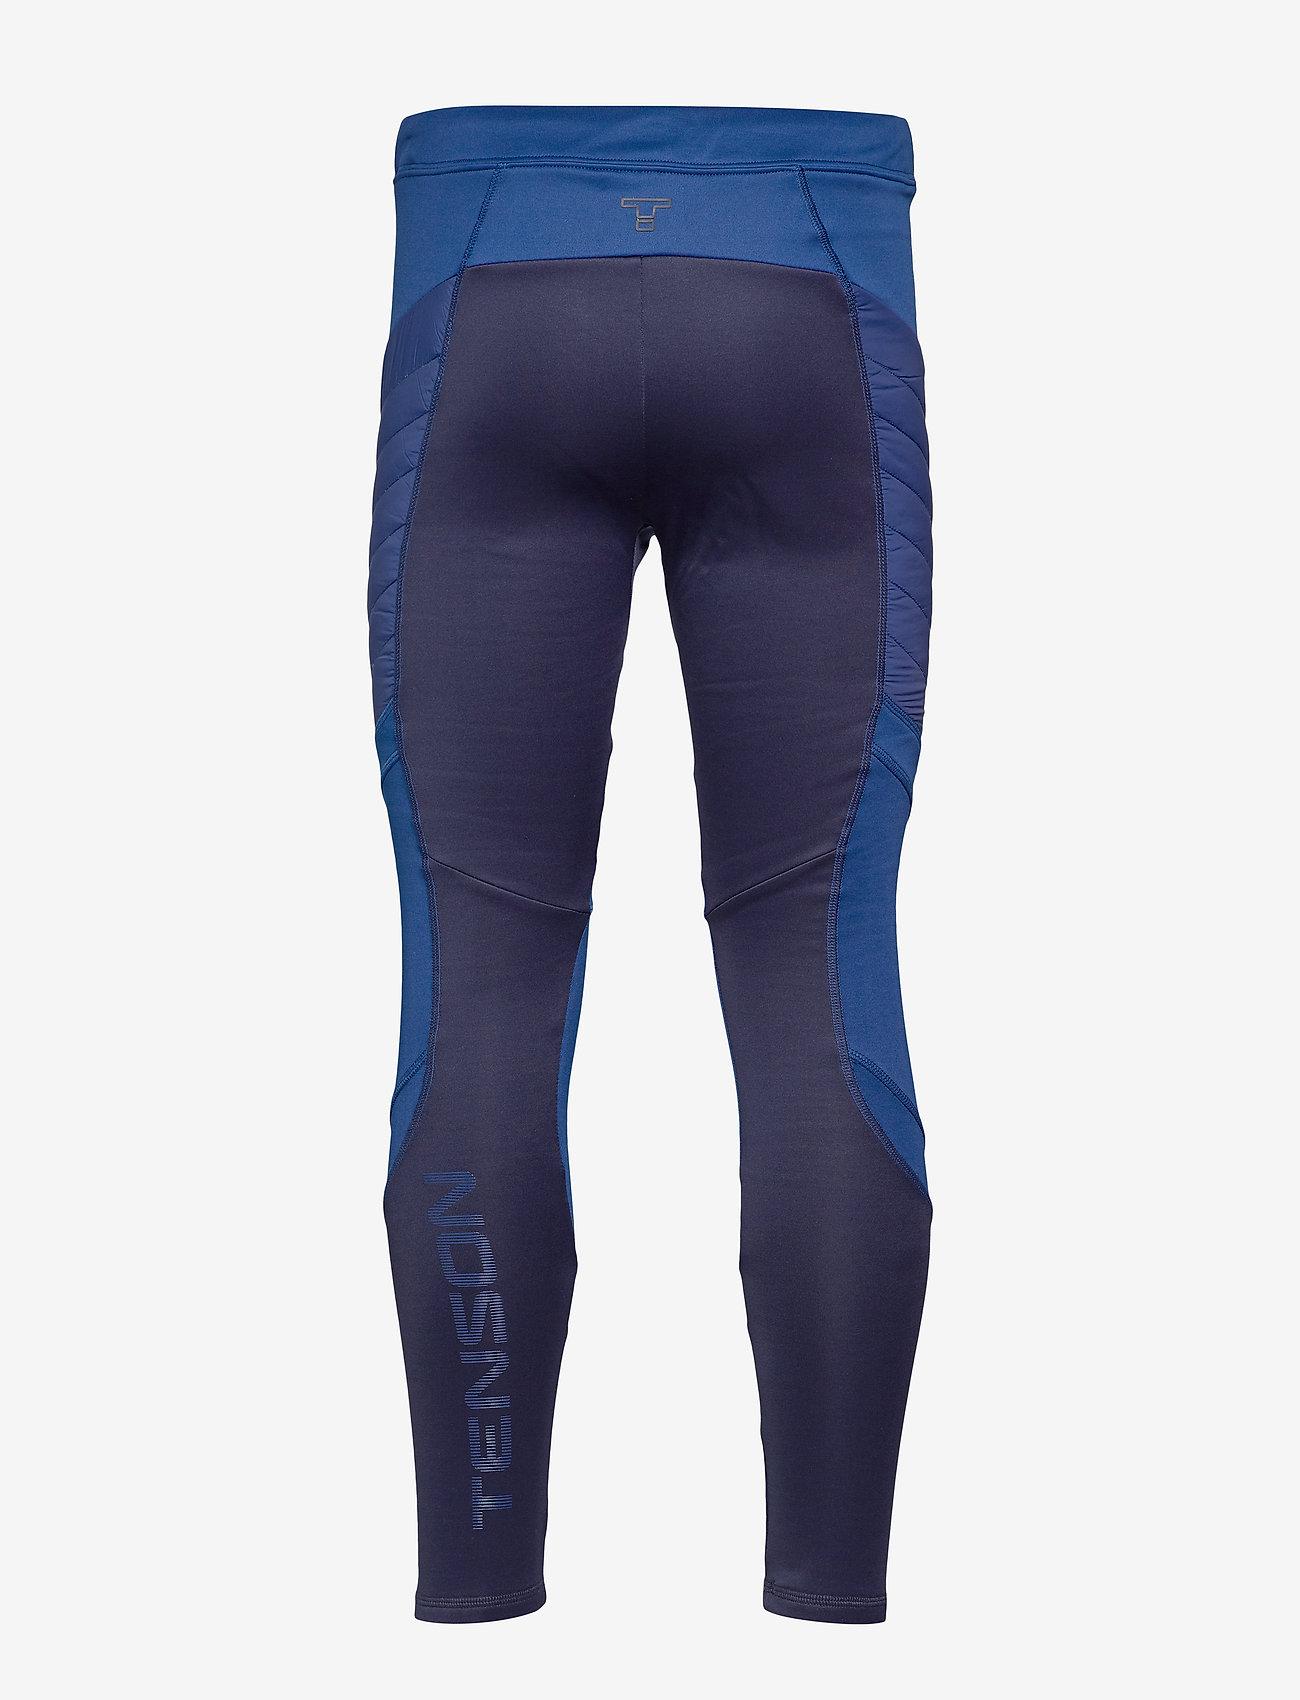 Tenson - Thermo Pants - bottoms - blue - 1